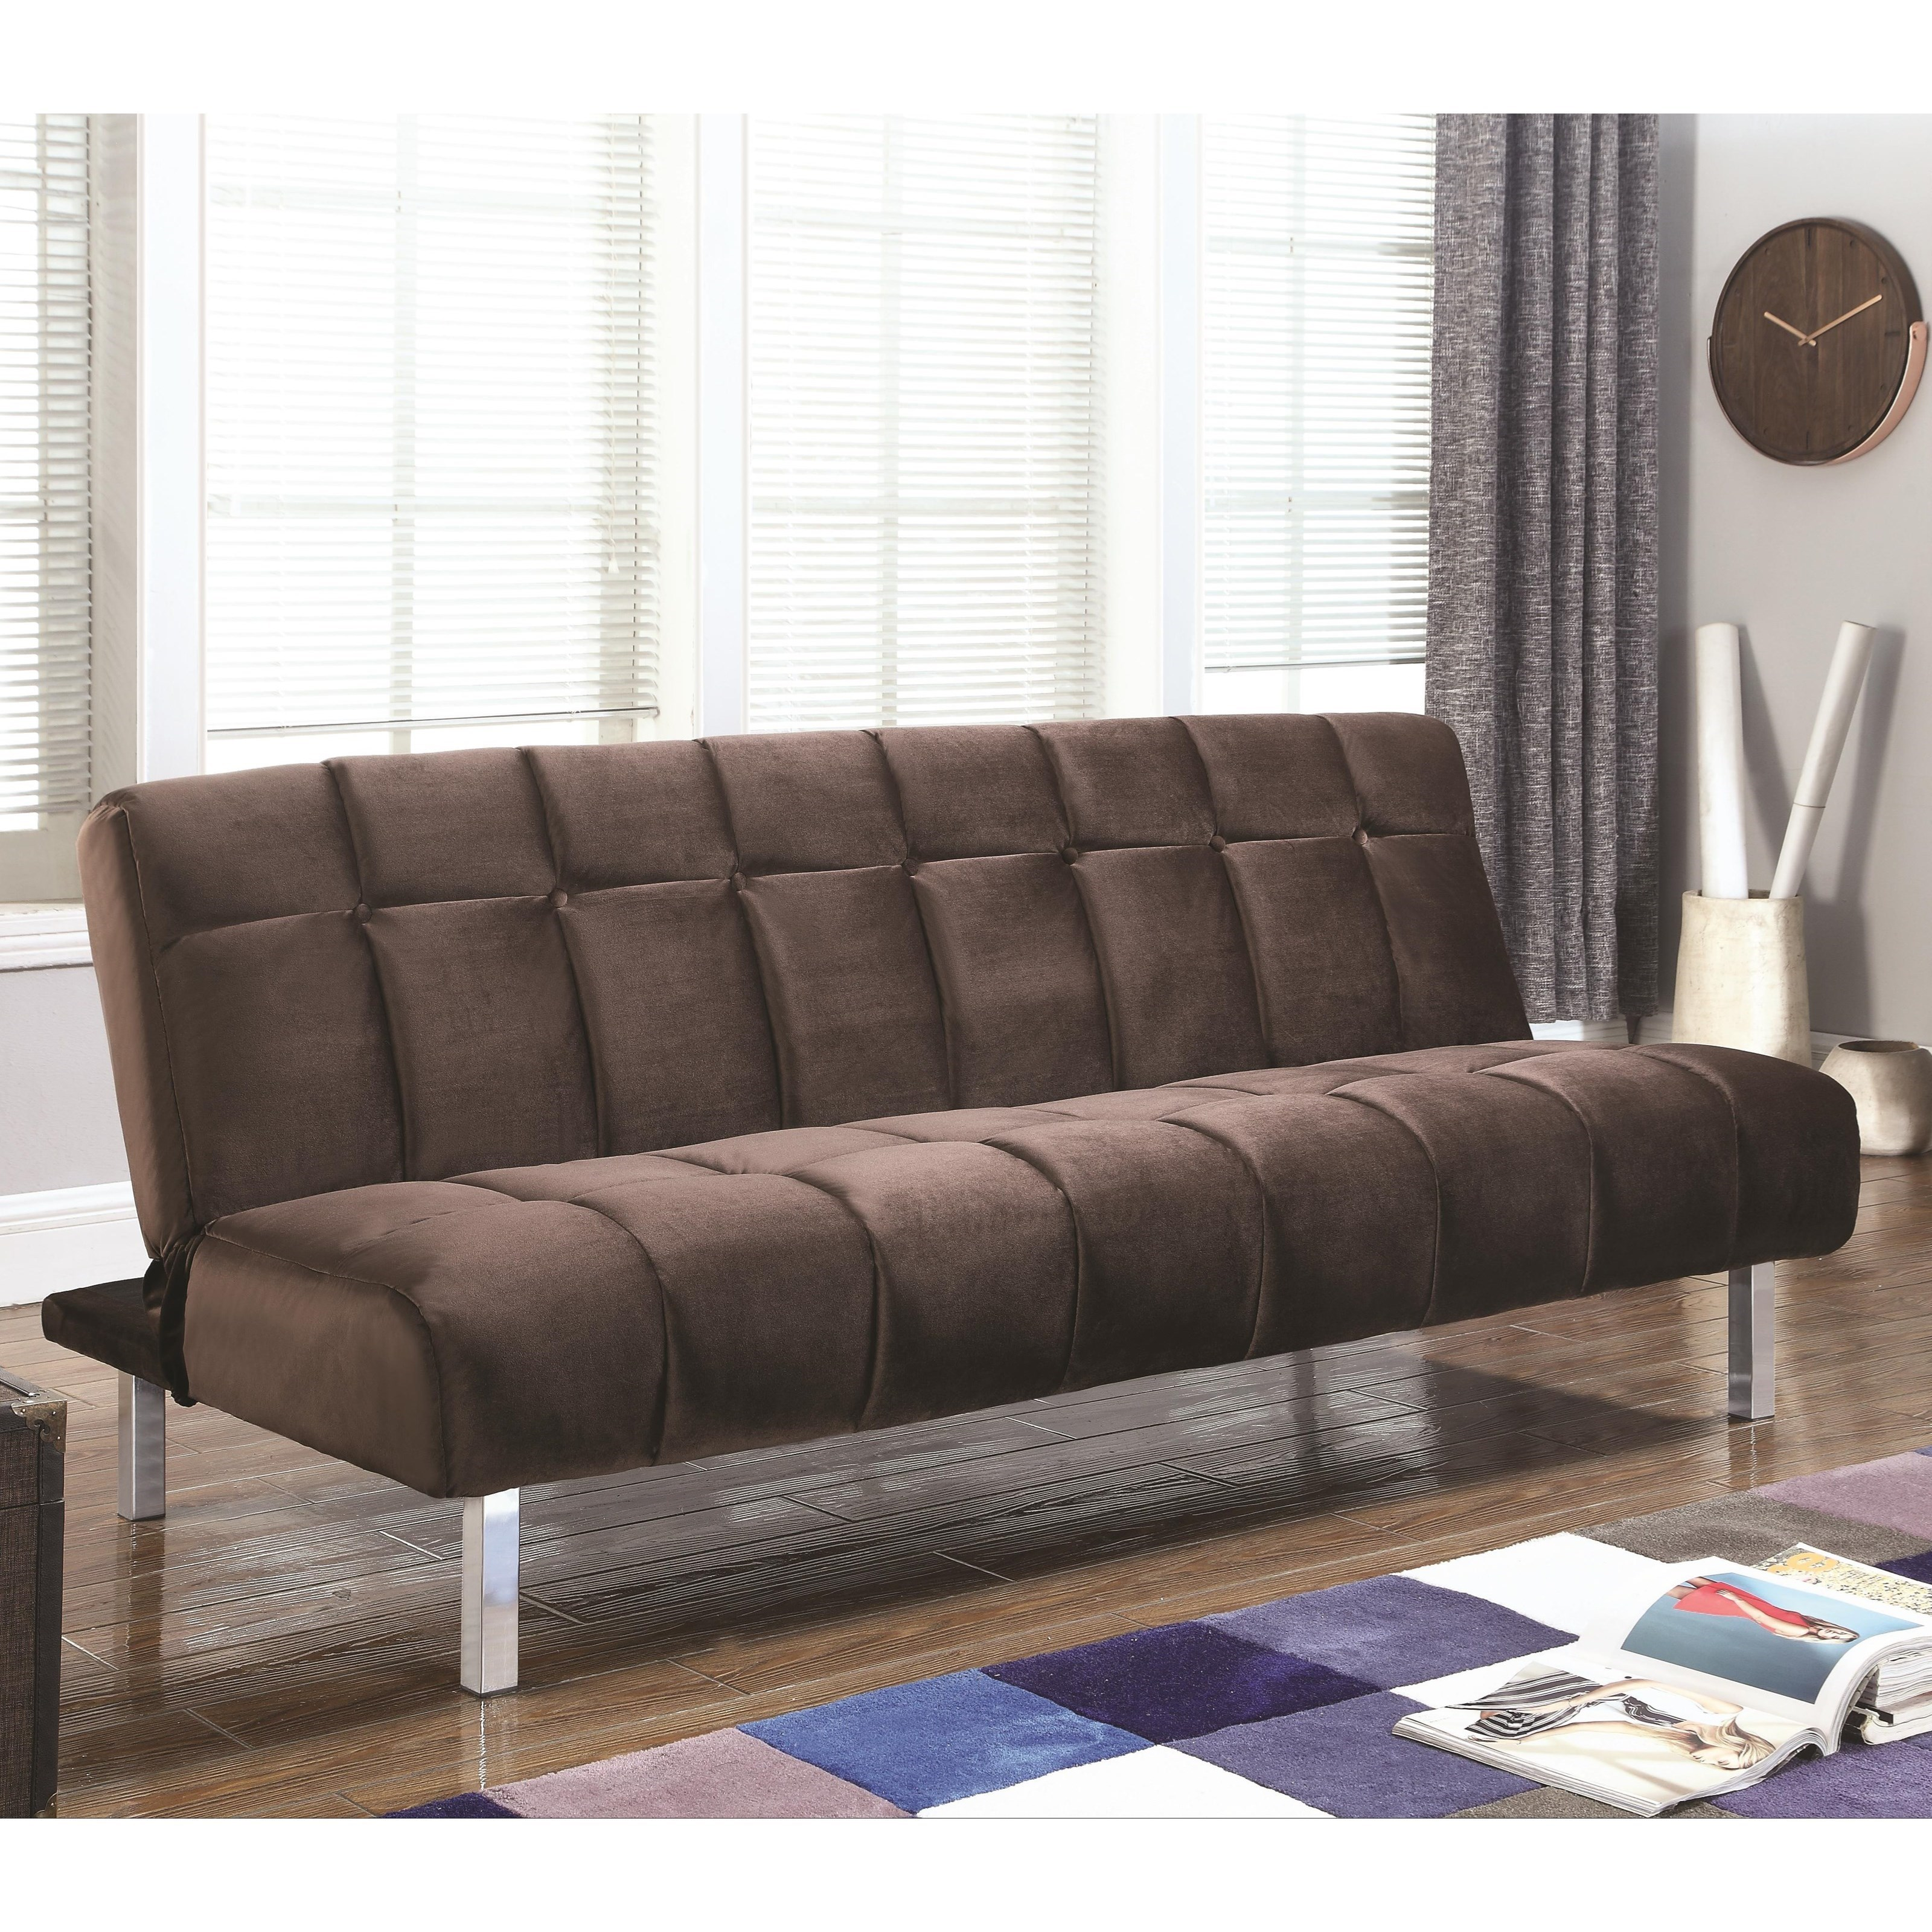 Coaster Sofa Beds And FutonsSofa Bed ...